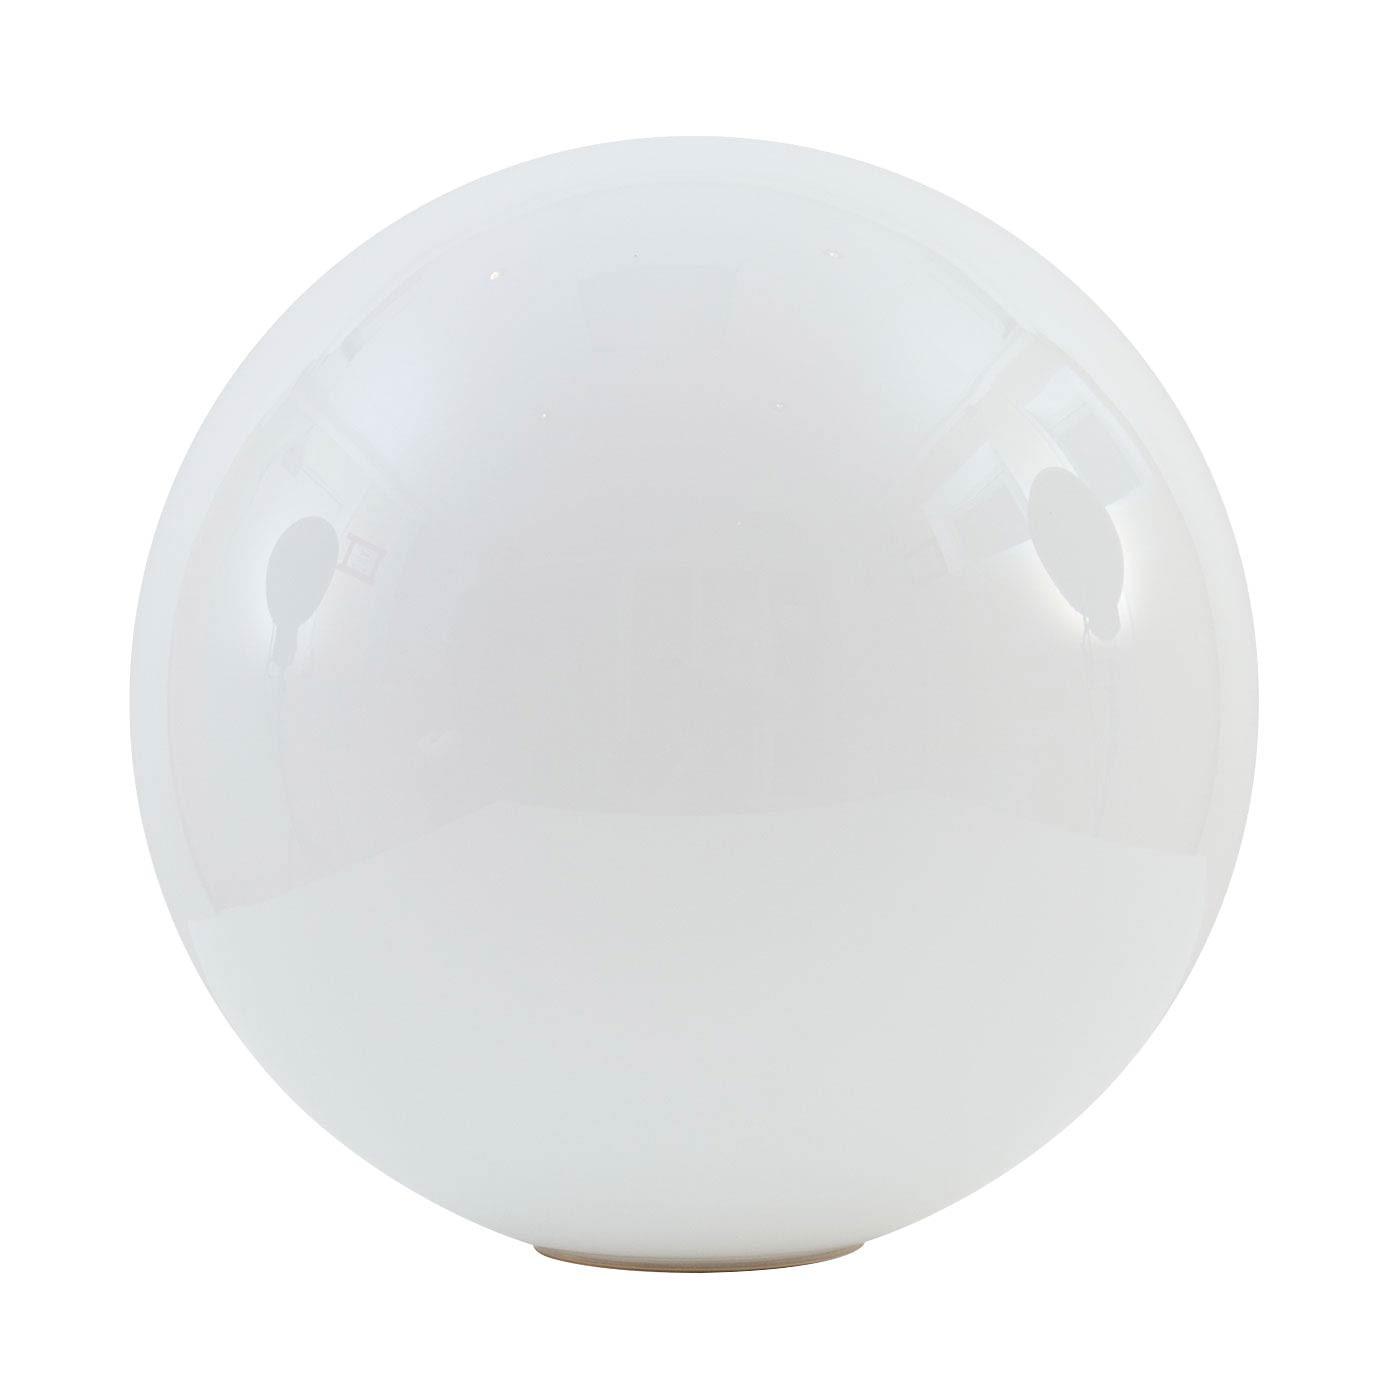 Flos IC Light C/W2, F2, S2 oder T2 Ersatzglaskugel